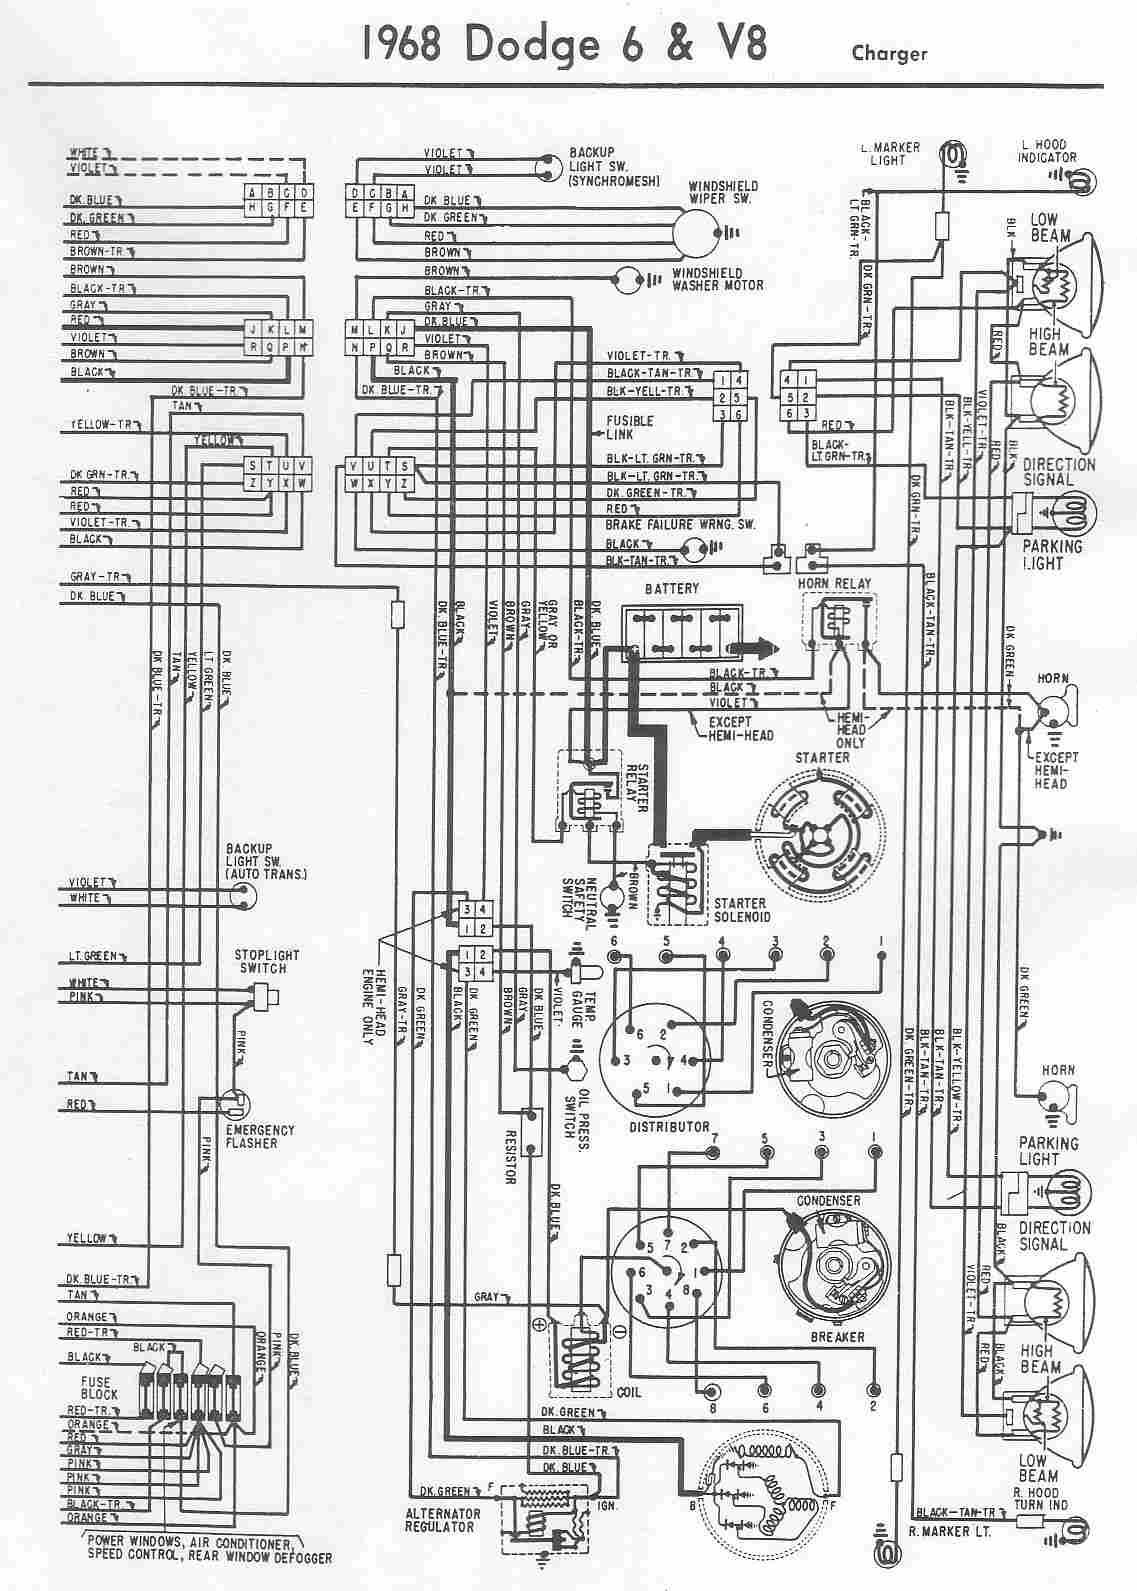 2003 dodge stratus 2 7 engine diagram wiring library rh 99 mac happen de 04 dodge stratus engine diagram 2001 dodge stratus engine diagram [ 1137 x 1591 Pixel ]